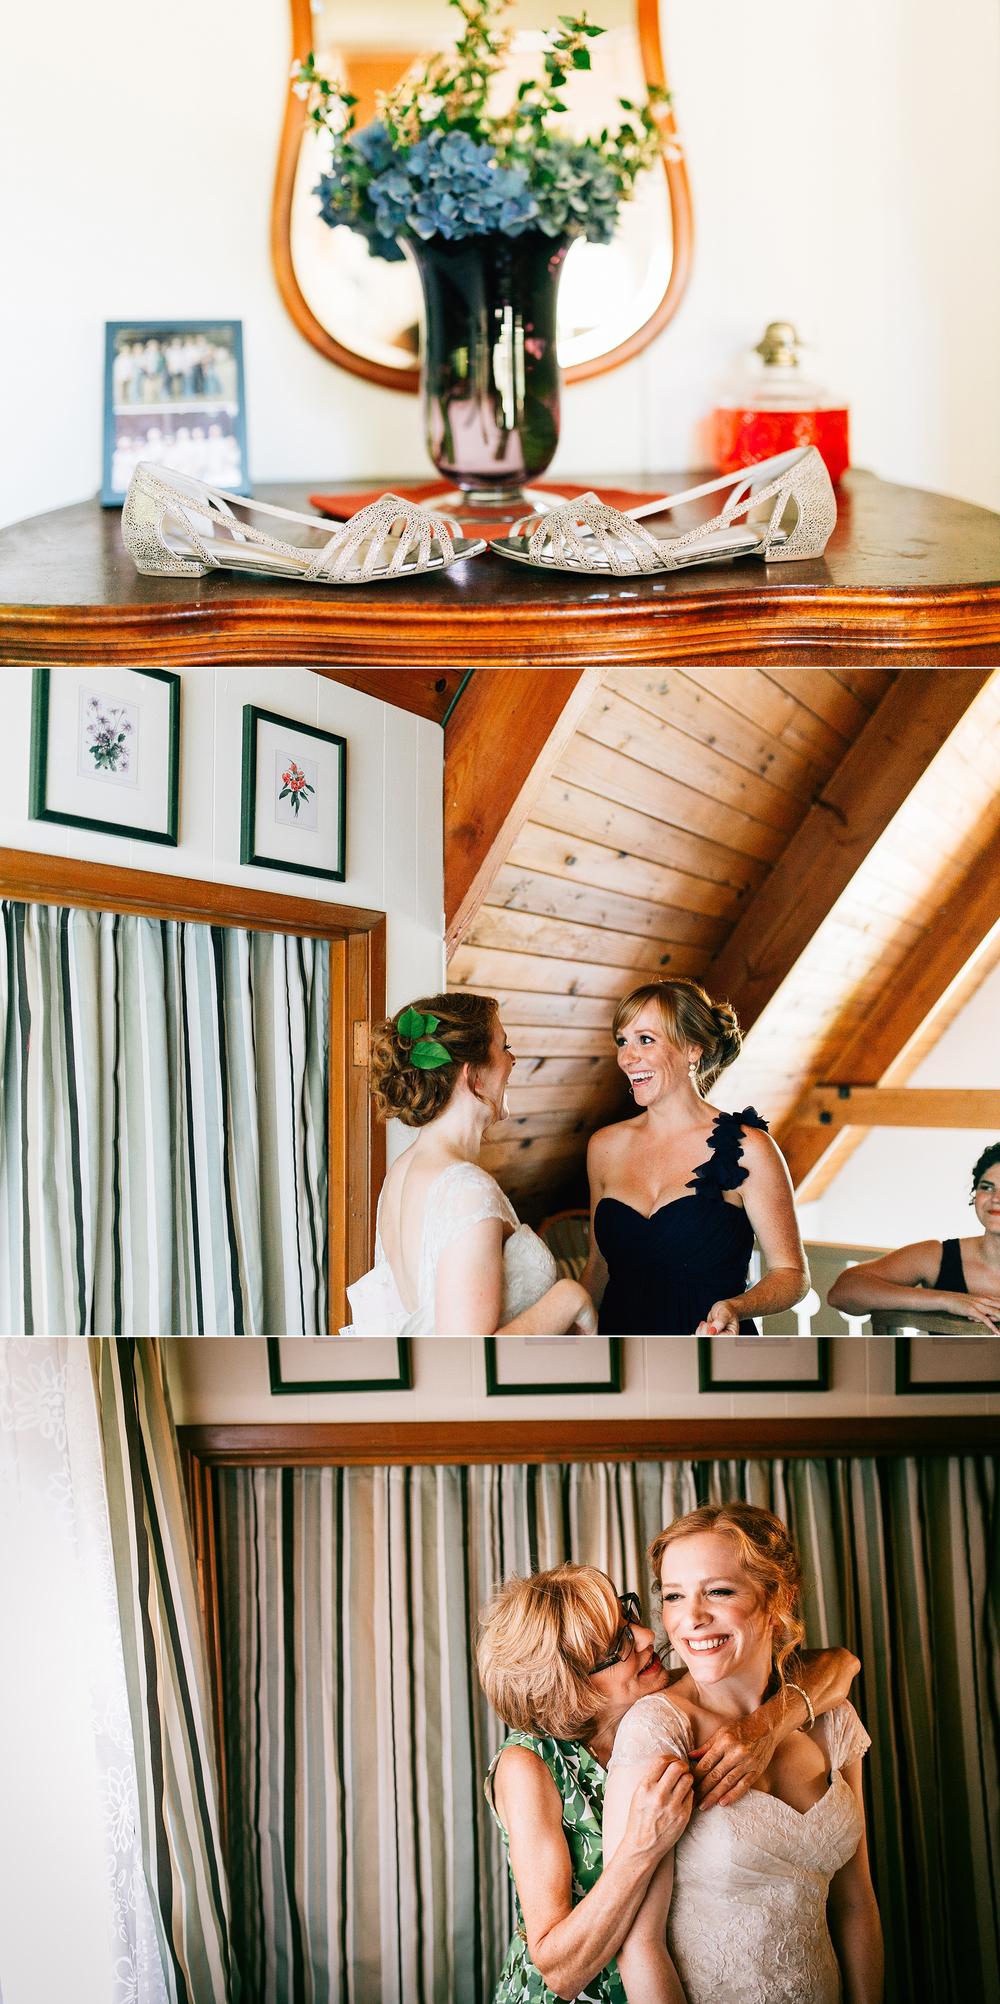 ashley vos photography seattle area wedding photographer_0696.jpg